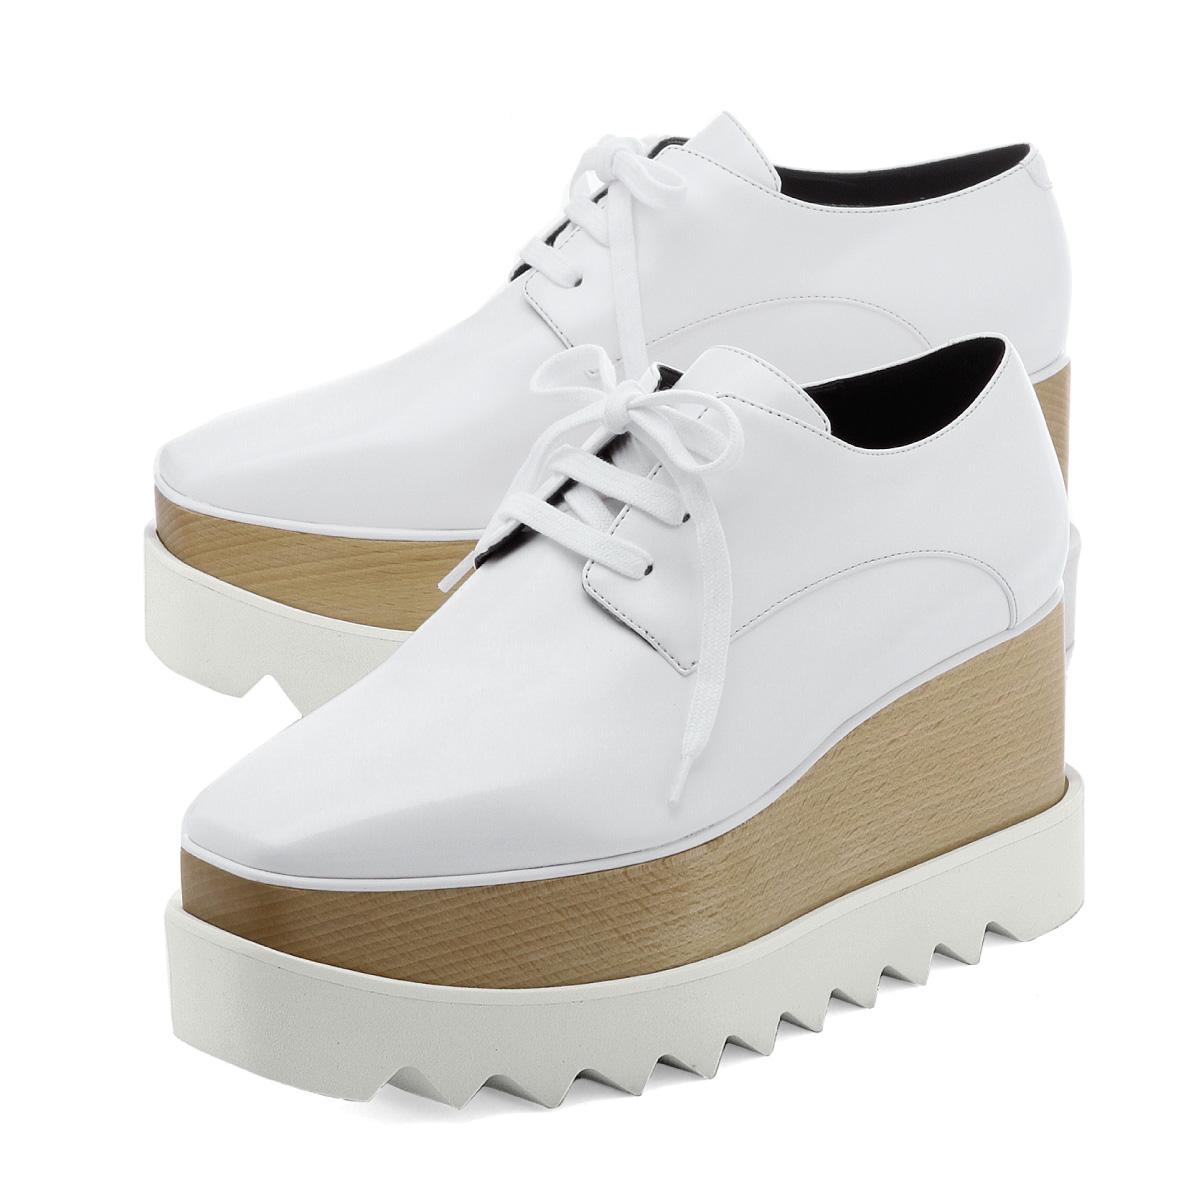 37c17a050106 importshopdouble  Stella McCartney STELLA McCARTNEY shoes Lady s 363997  W0XH0 9000 sneakers ELYSE Ellis WHITE white